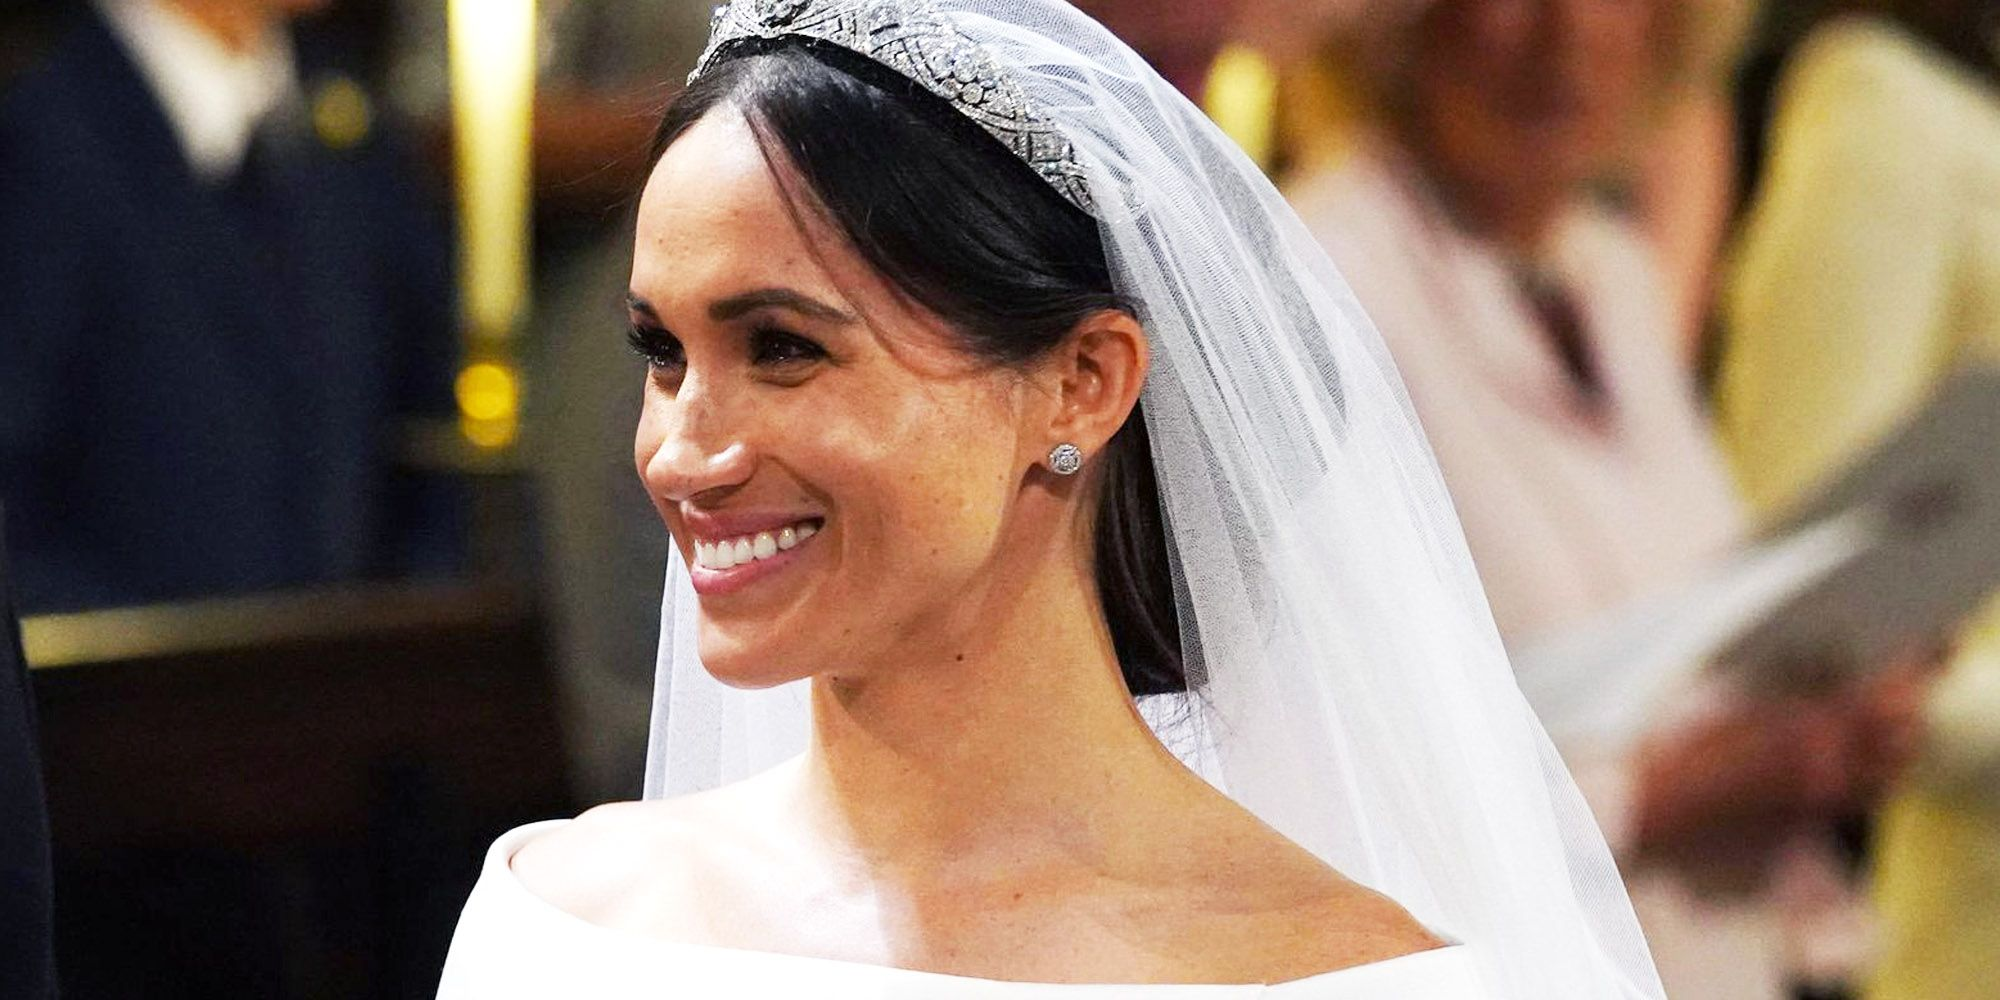 Meghan Markle Accessorizes Her Wedding Dress with Cartier Diamonds